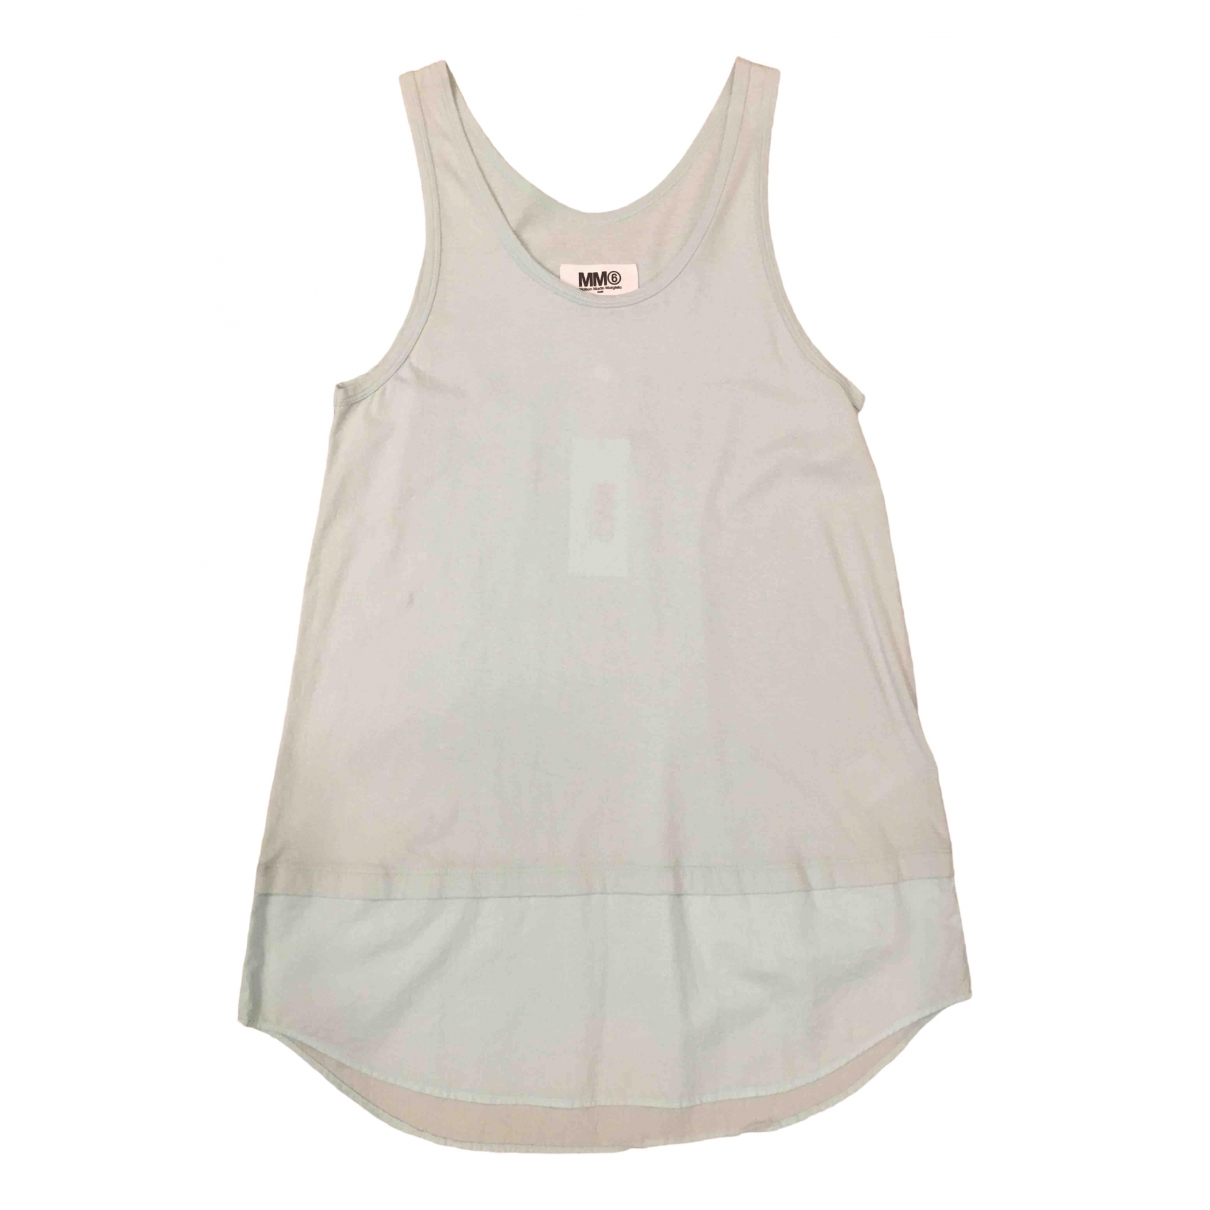 Mm6 \N Kleid in  Gruen Baumwolle